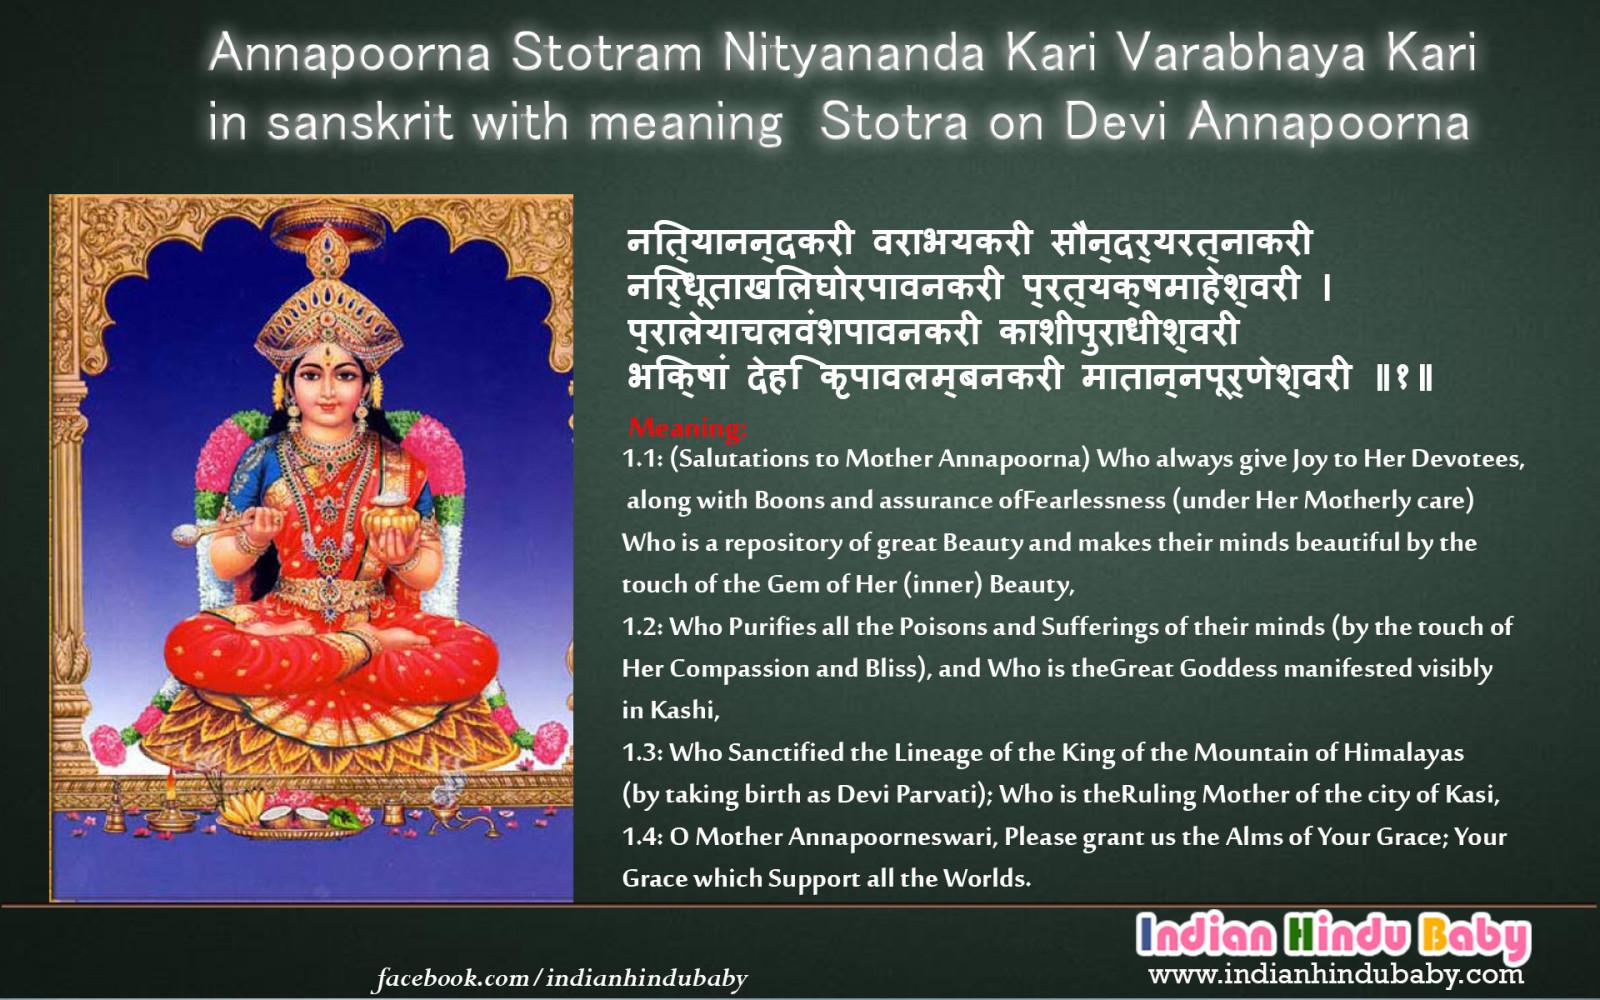 Annapoorna Stotram Nityananda Kari Varabhaya Kari in sanskrit with meaning Stotra on Devi Annapoorna